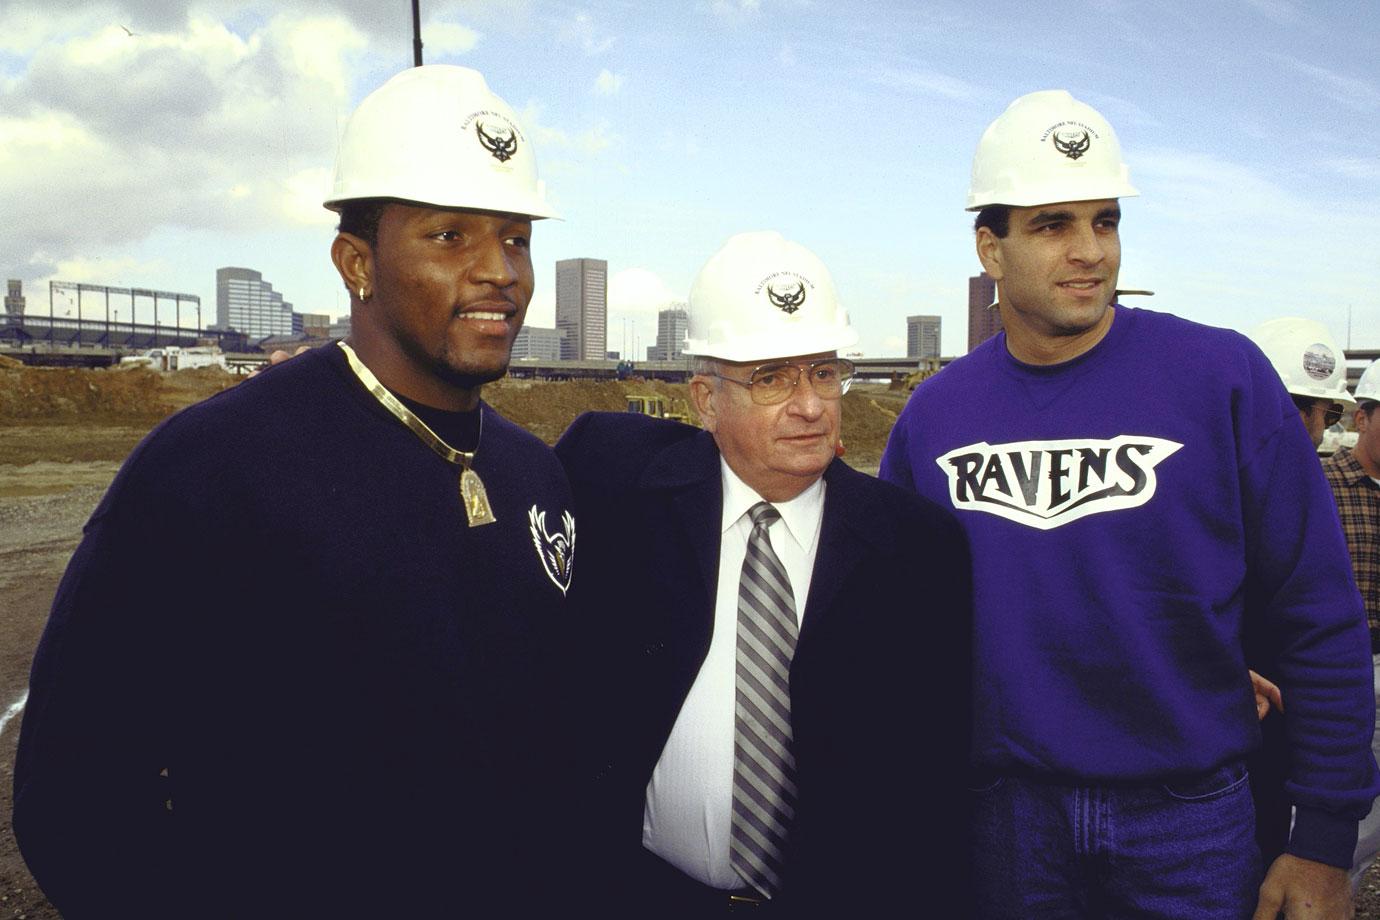 Nov. 26, 1996